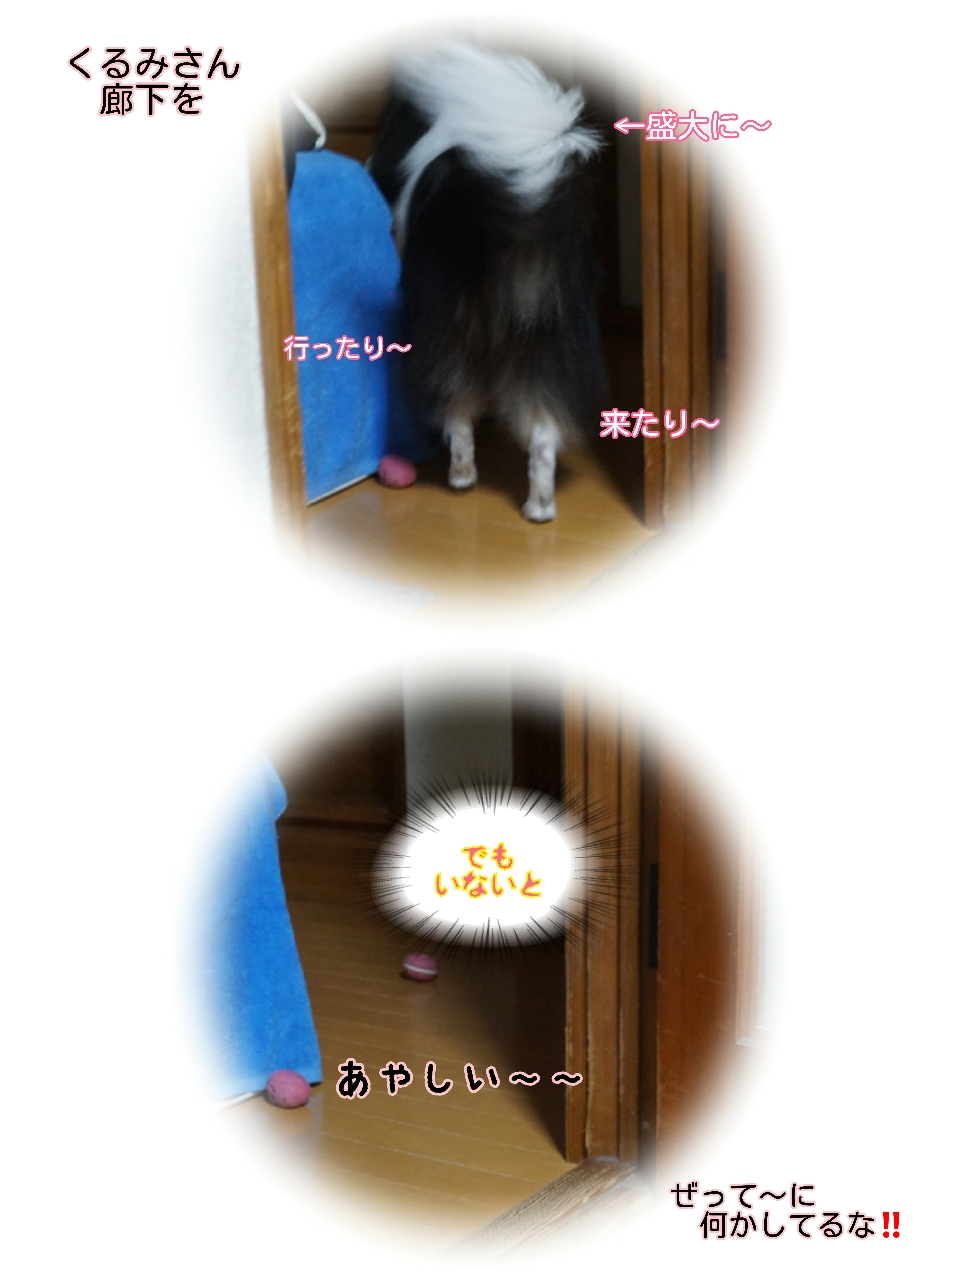 16-09-20-12-20-08-338_deco.jpg